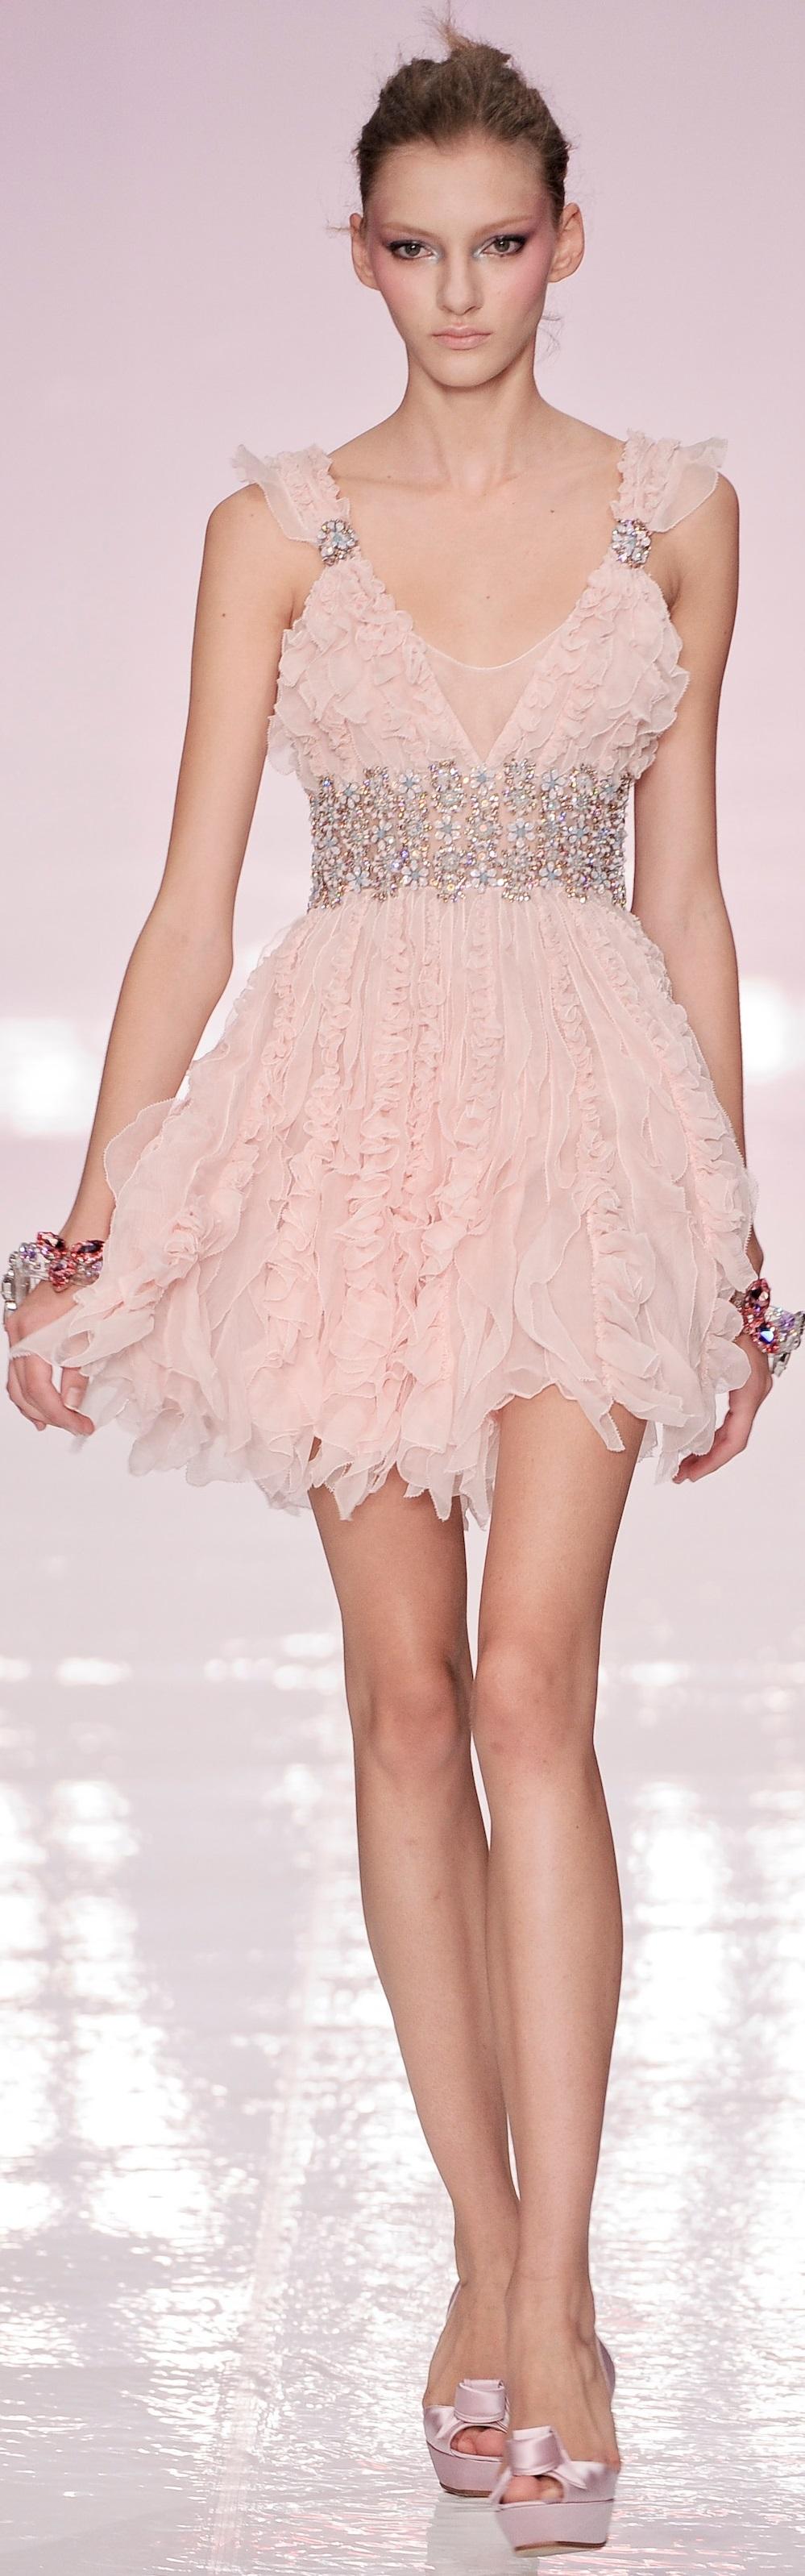 Jenny Packham spring 2009 | vestidos | Pinterest | Alta moda, Rosas ...